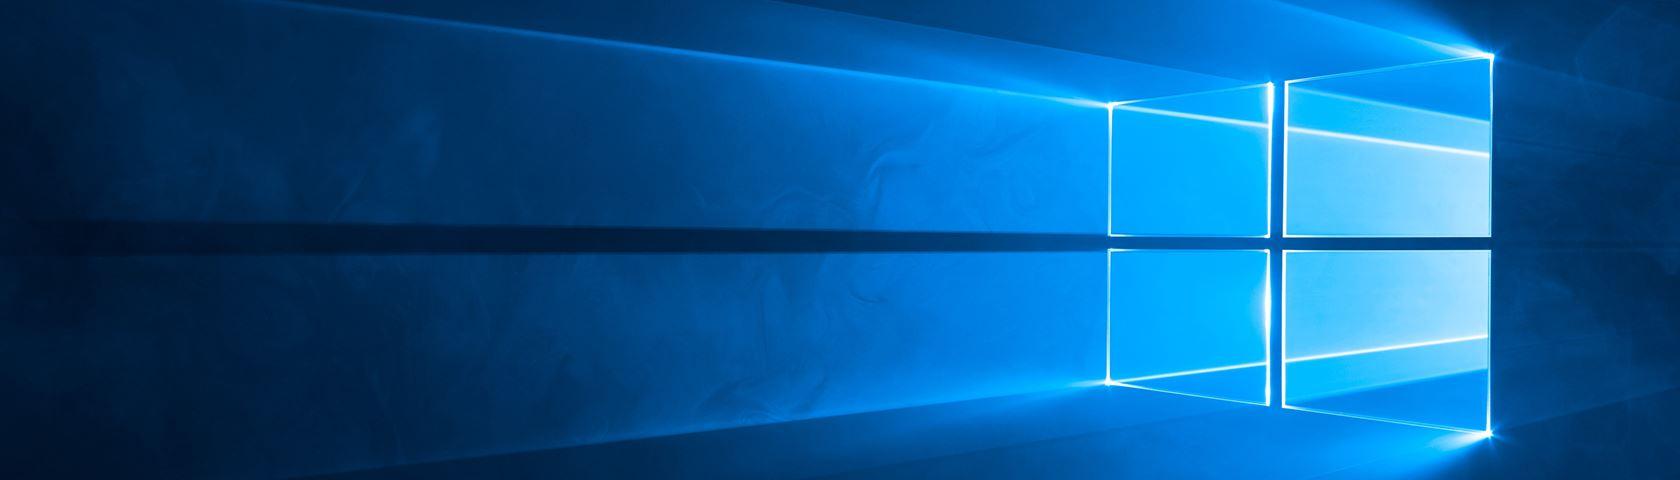 Windows 10 Window